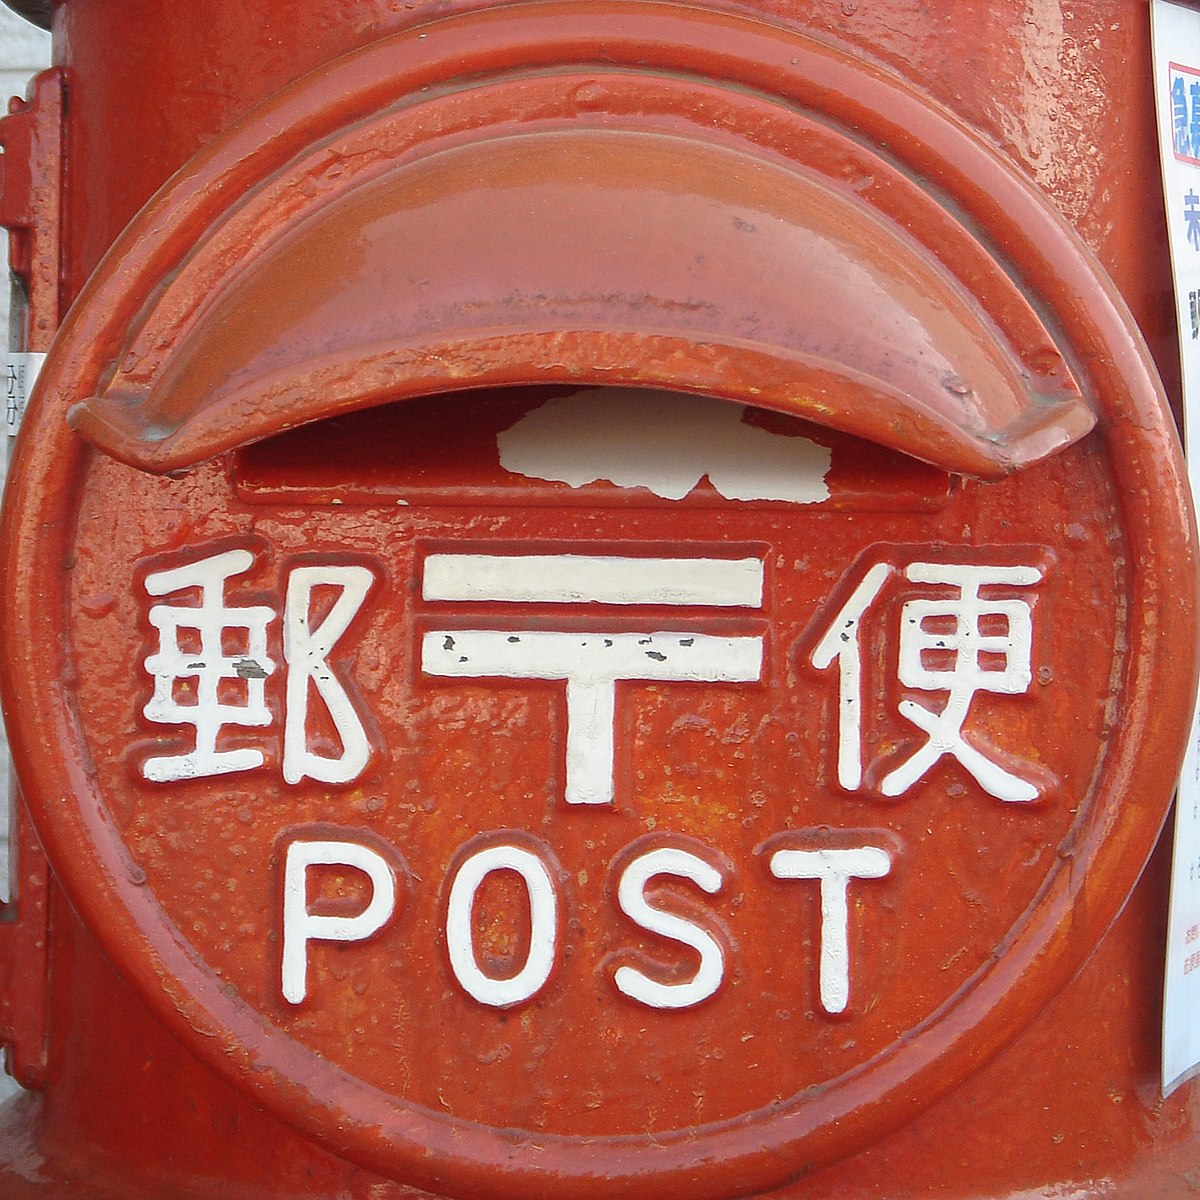 Post: Japan Post